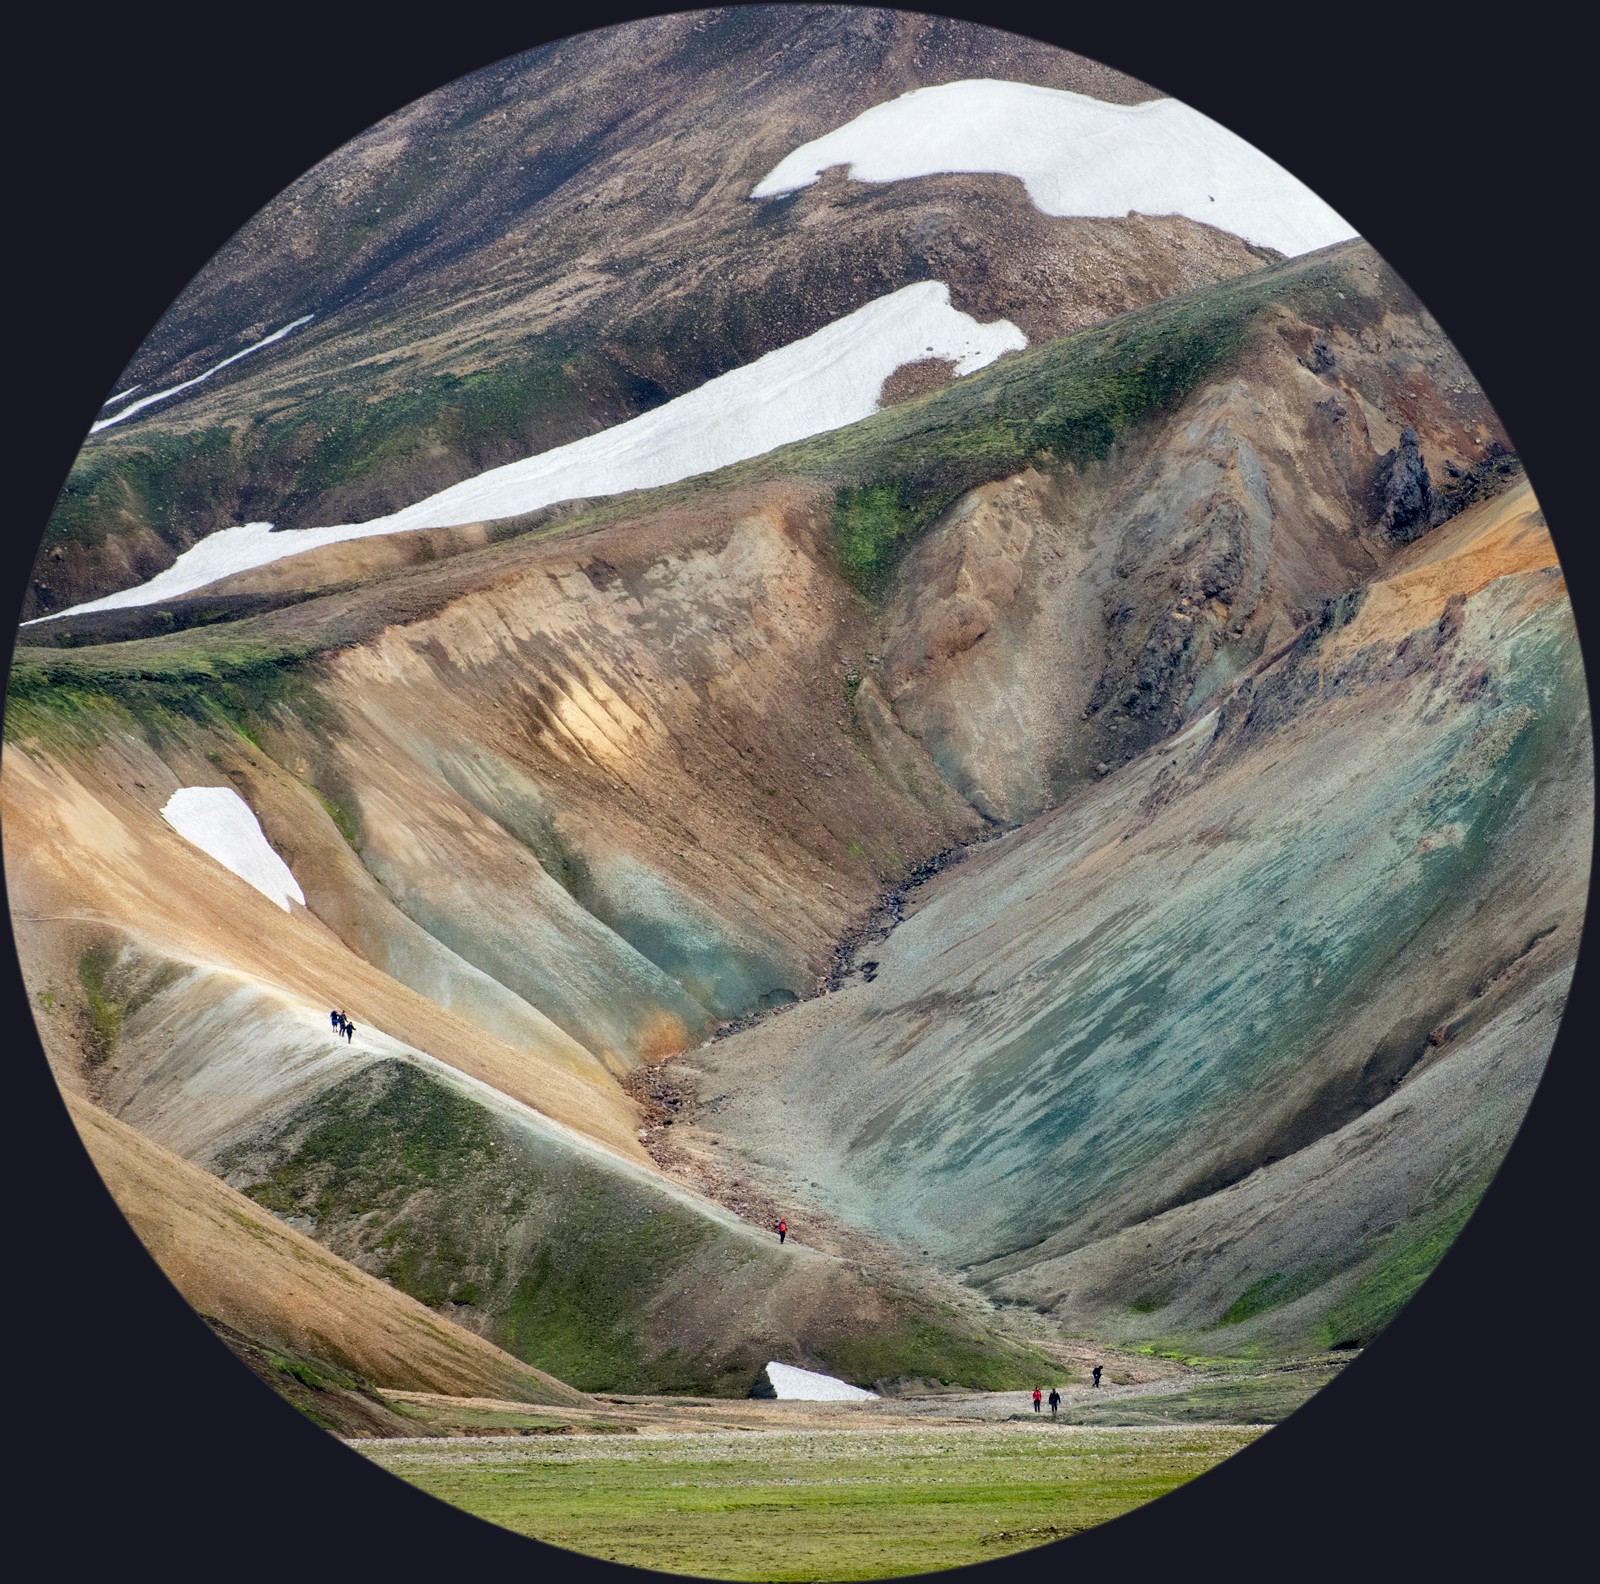 Recuerdos de Islandia I